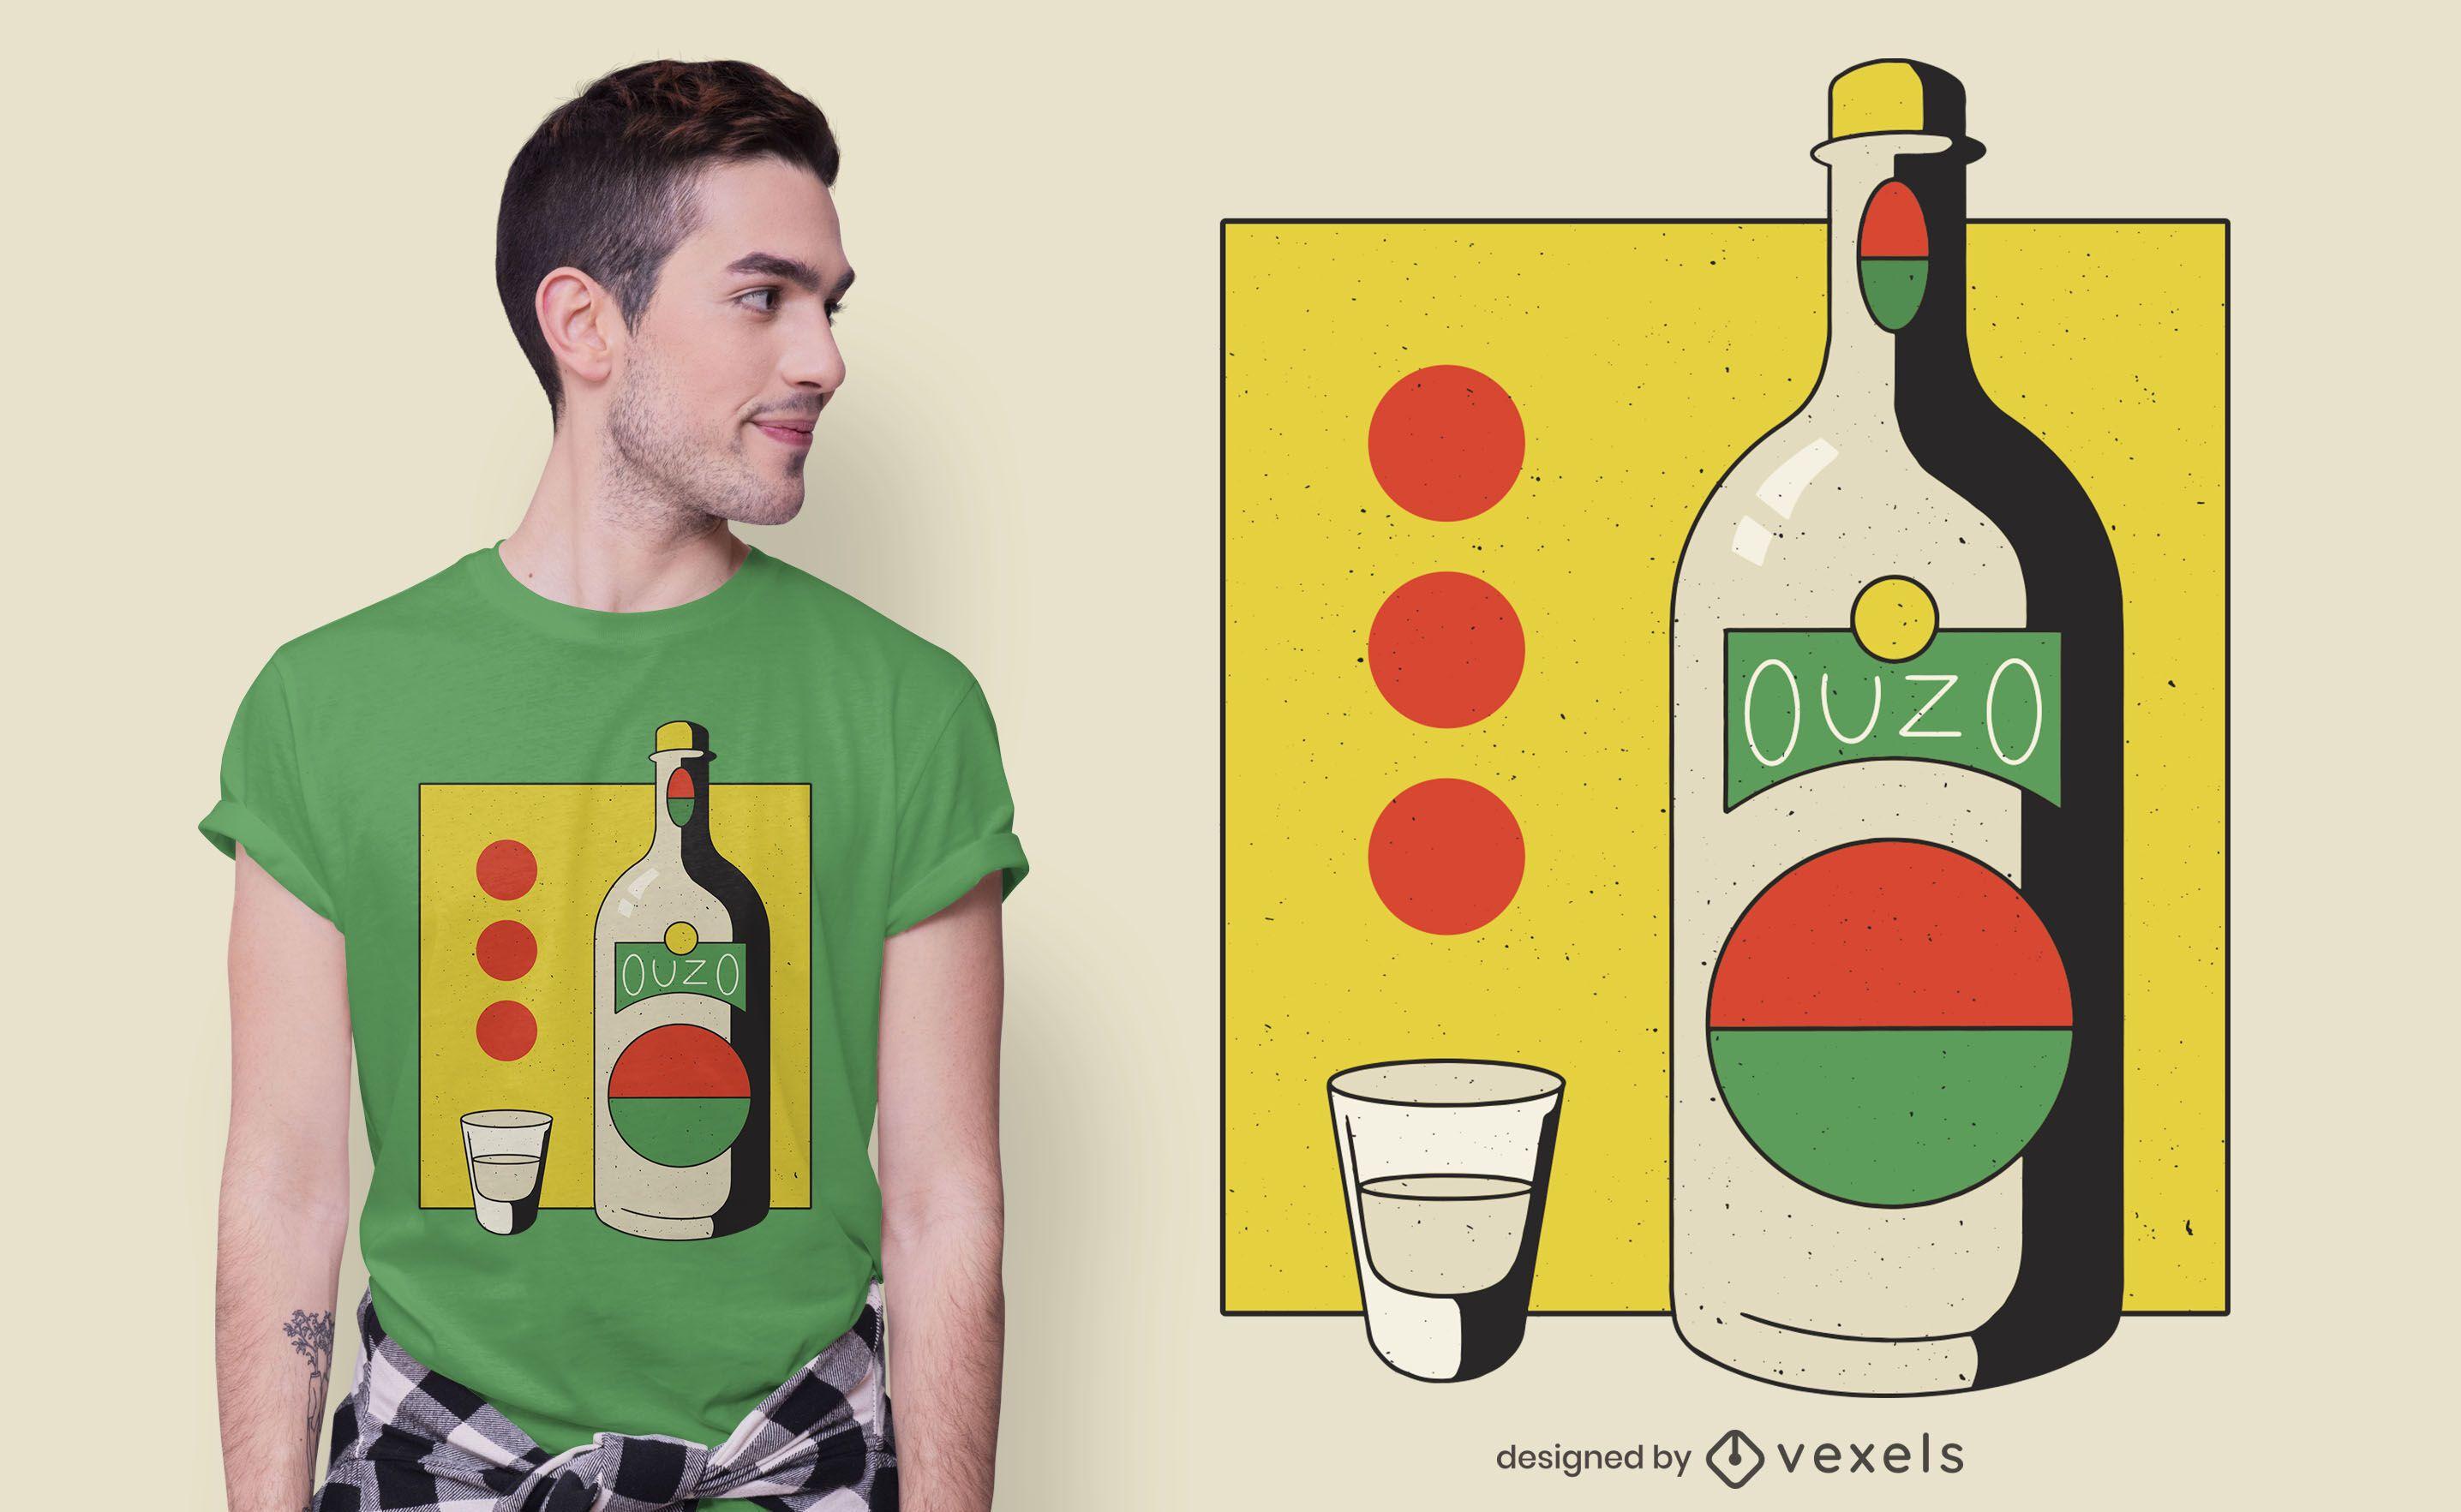 Ouzo bottle t-shirt design